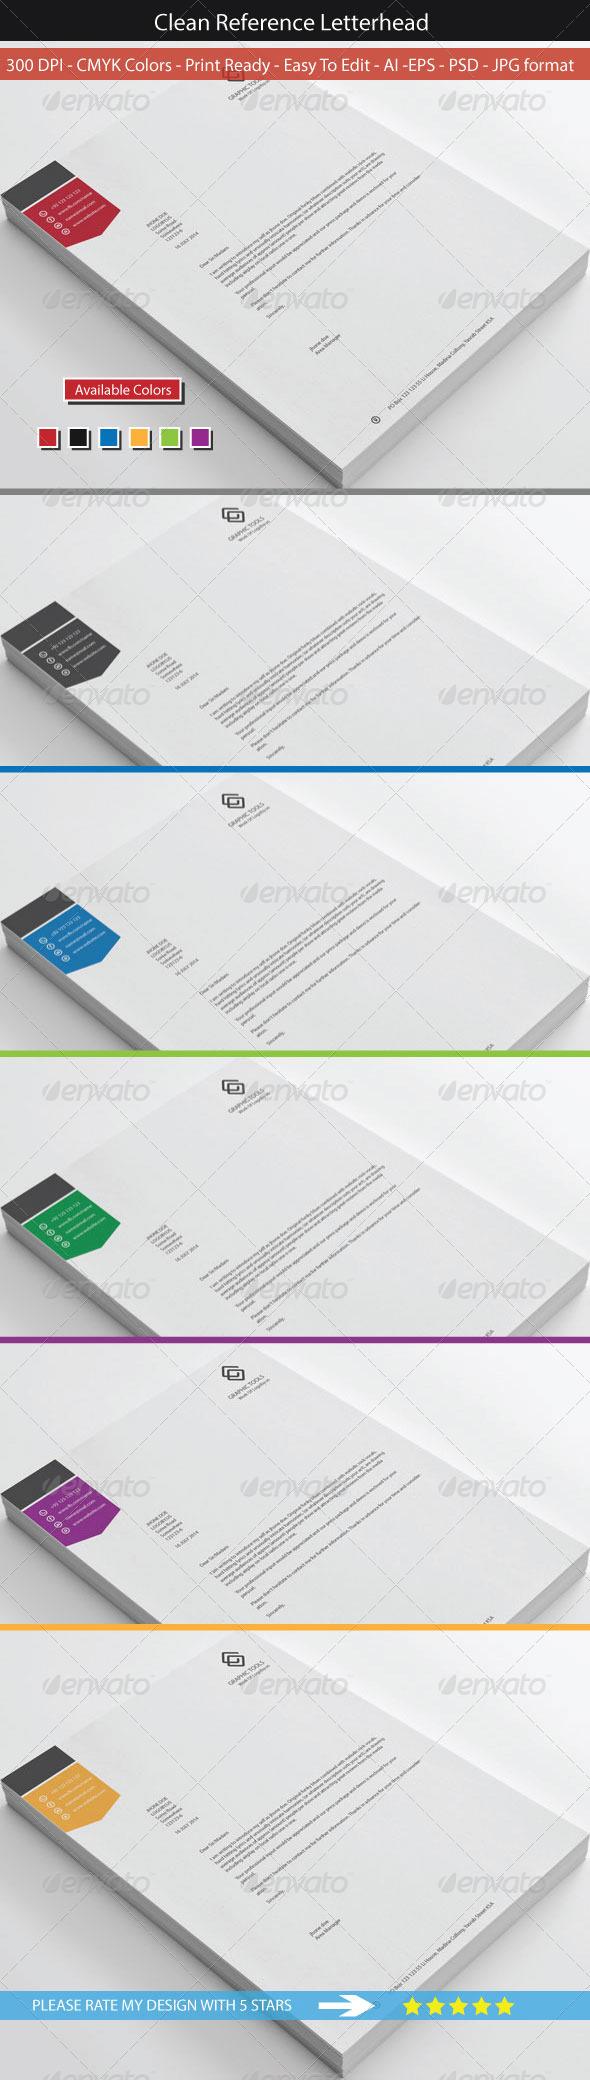 GraphicRiver Clean Reference Letterhead Design 8684404